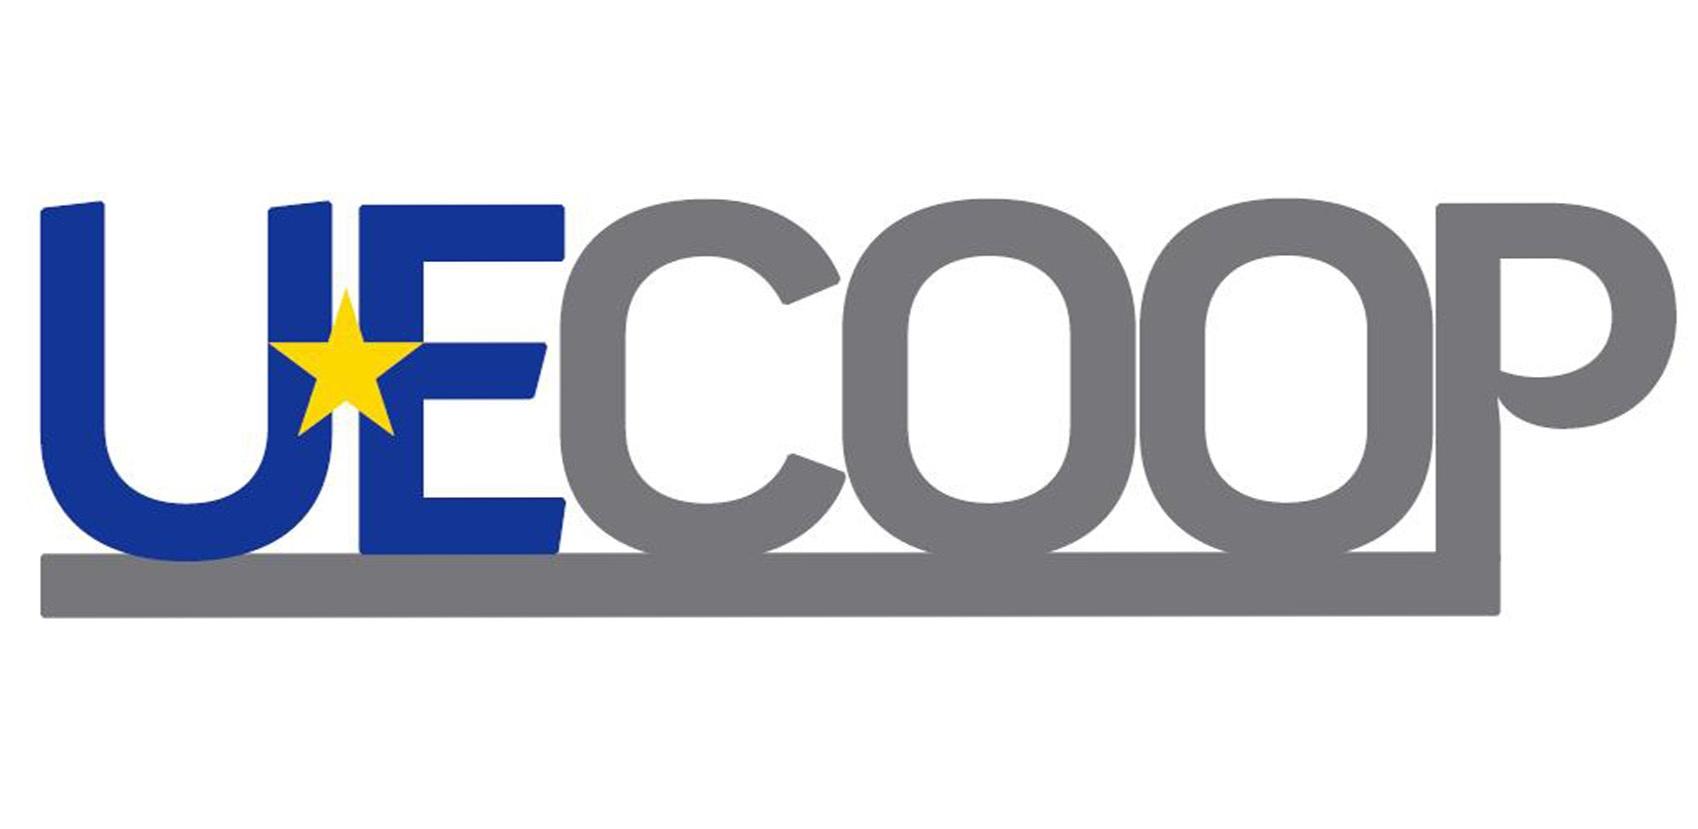 ue_coop logo